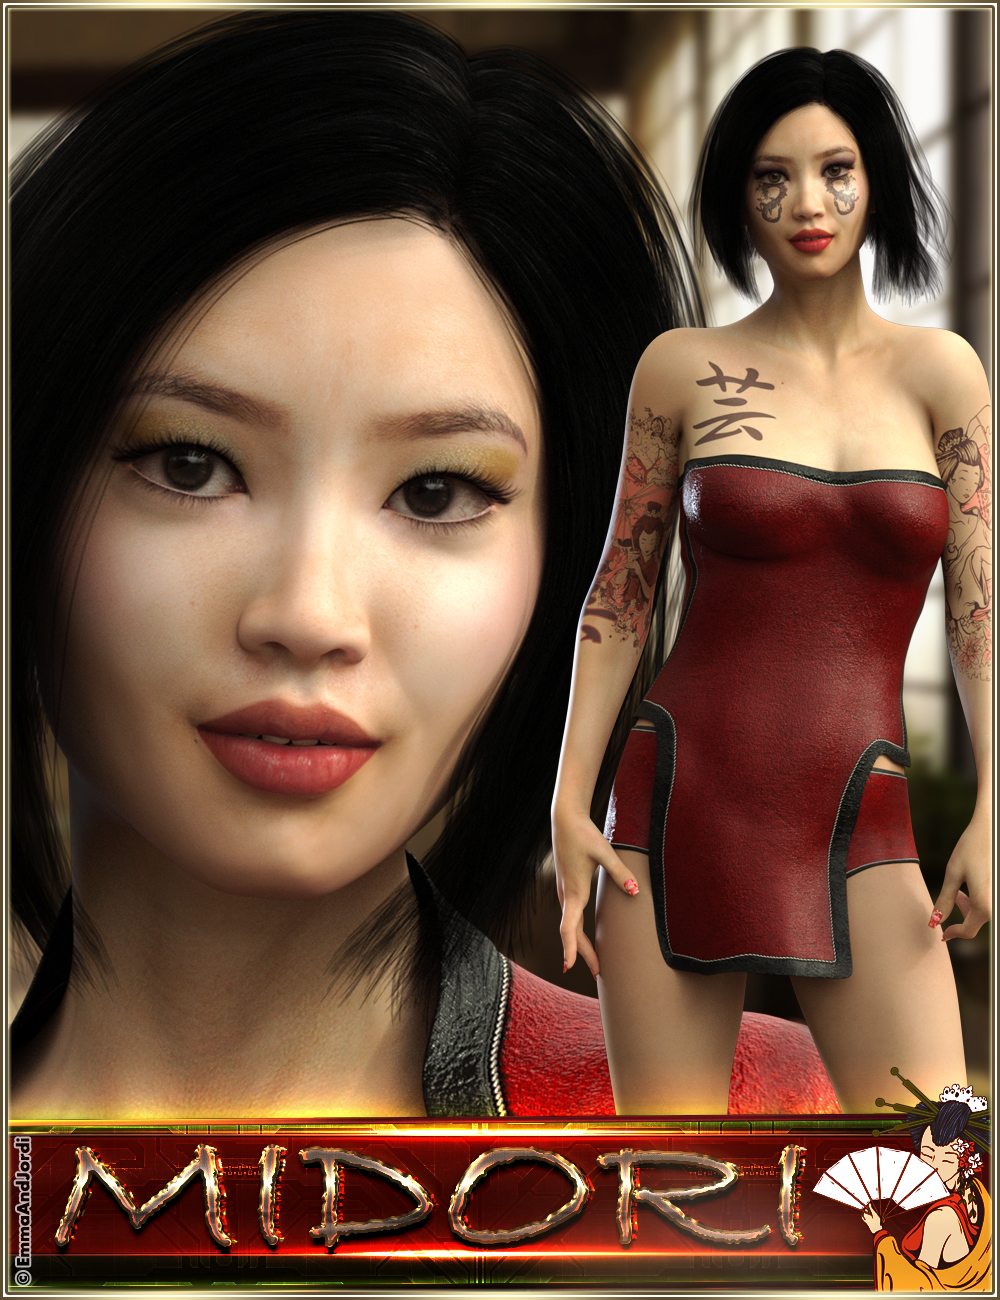 EJ Midori for Genesis 8 Female by: EmmaAndJordi, 3D Models by Daz 3D